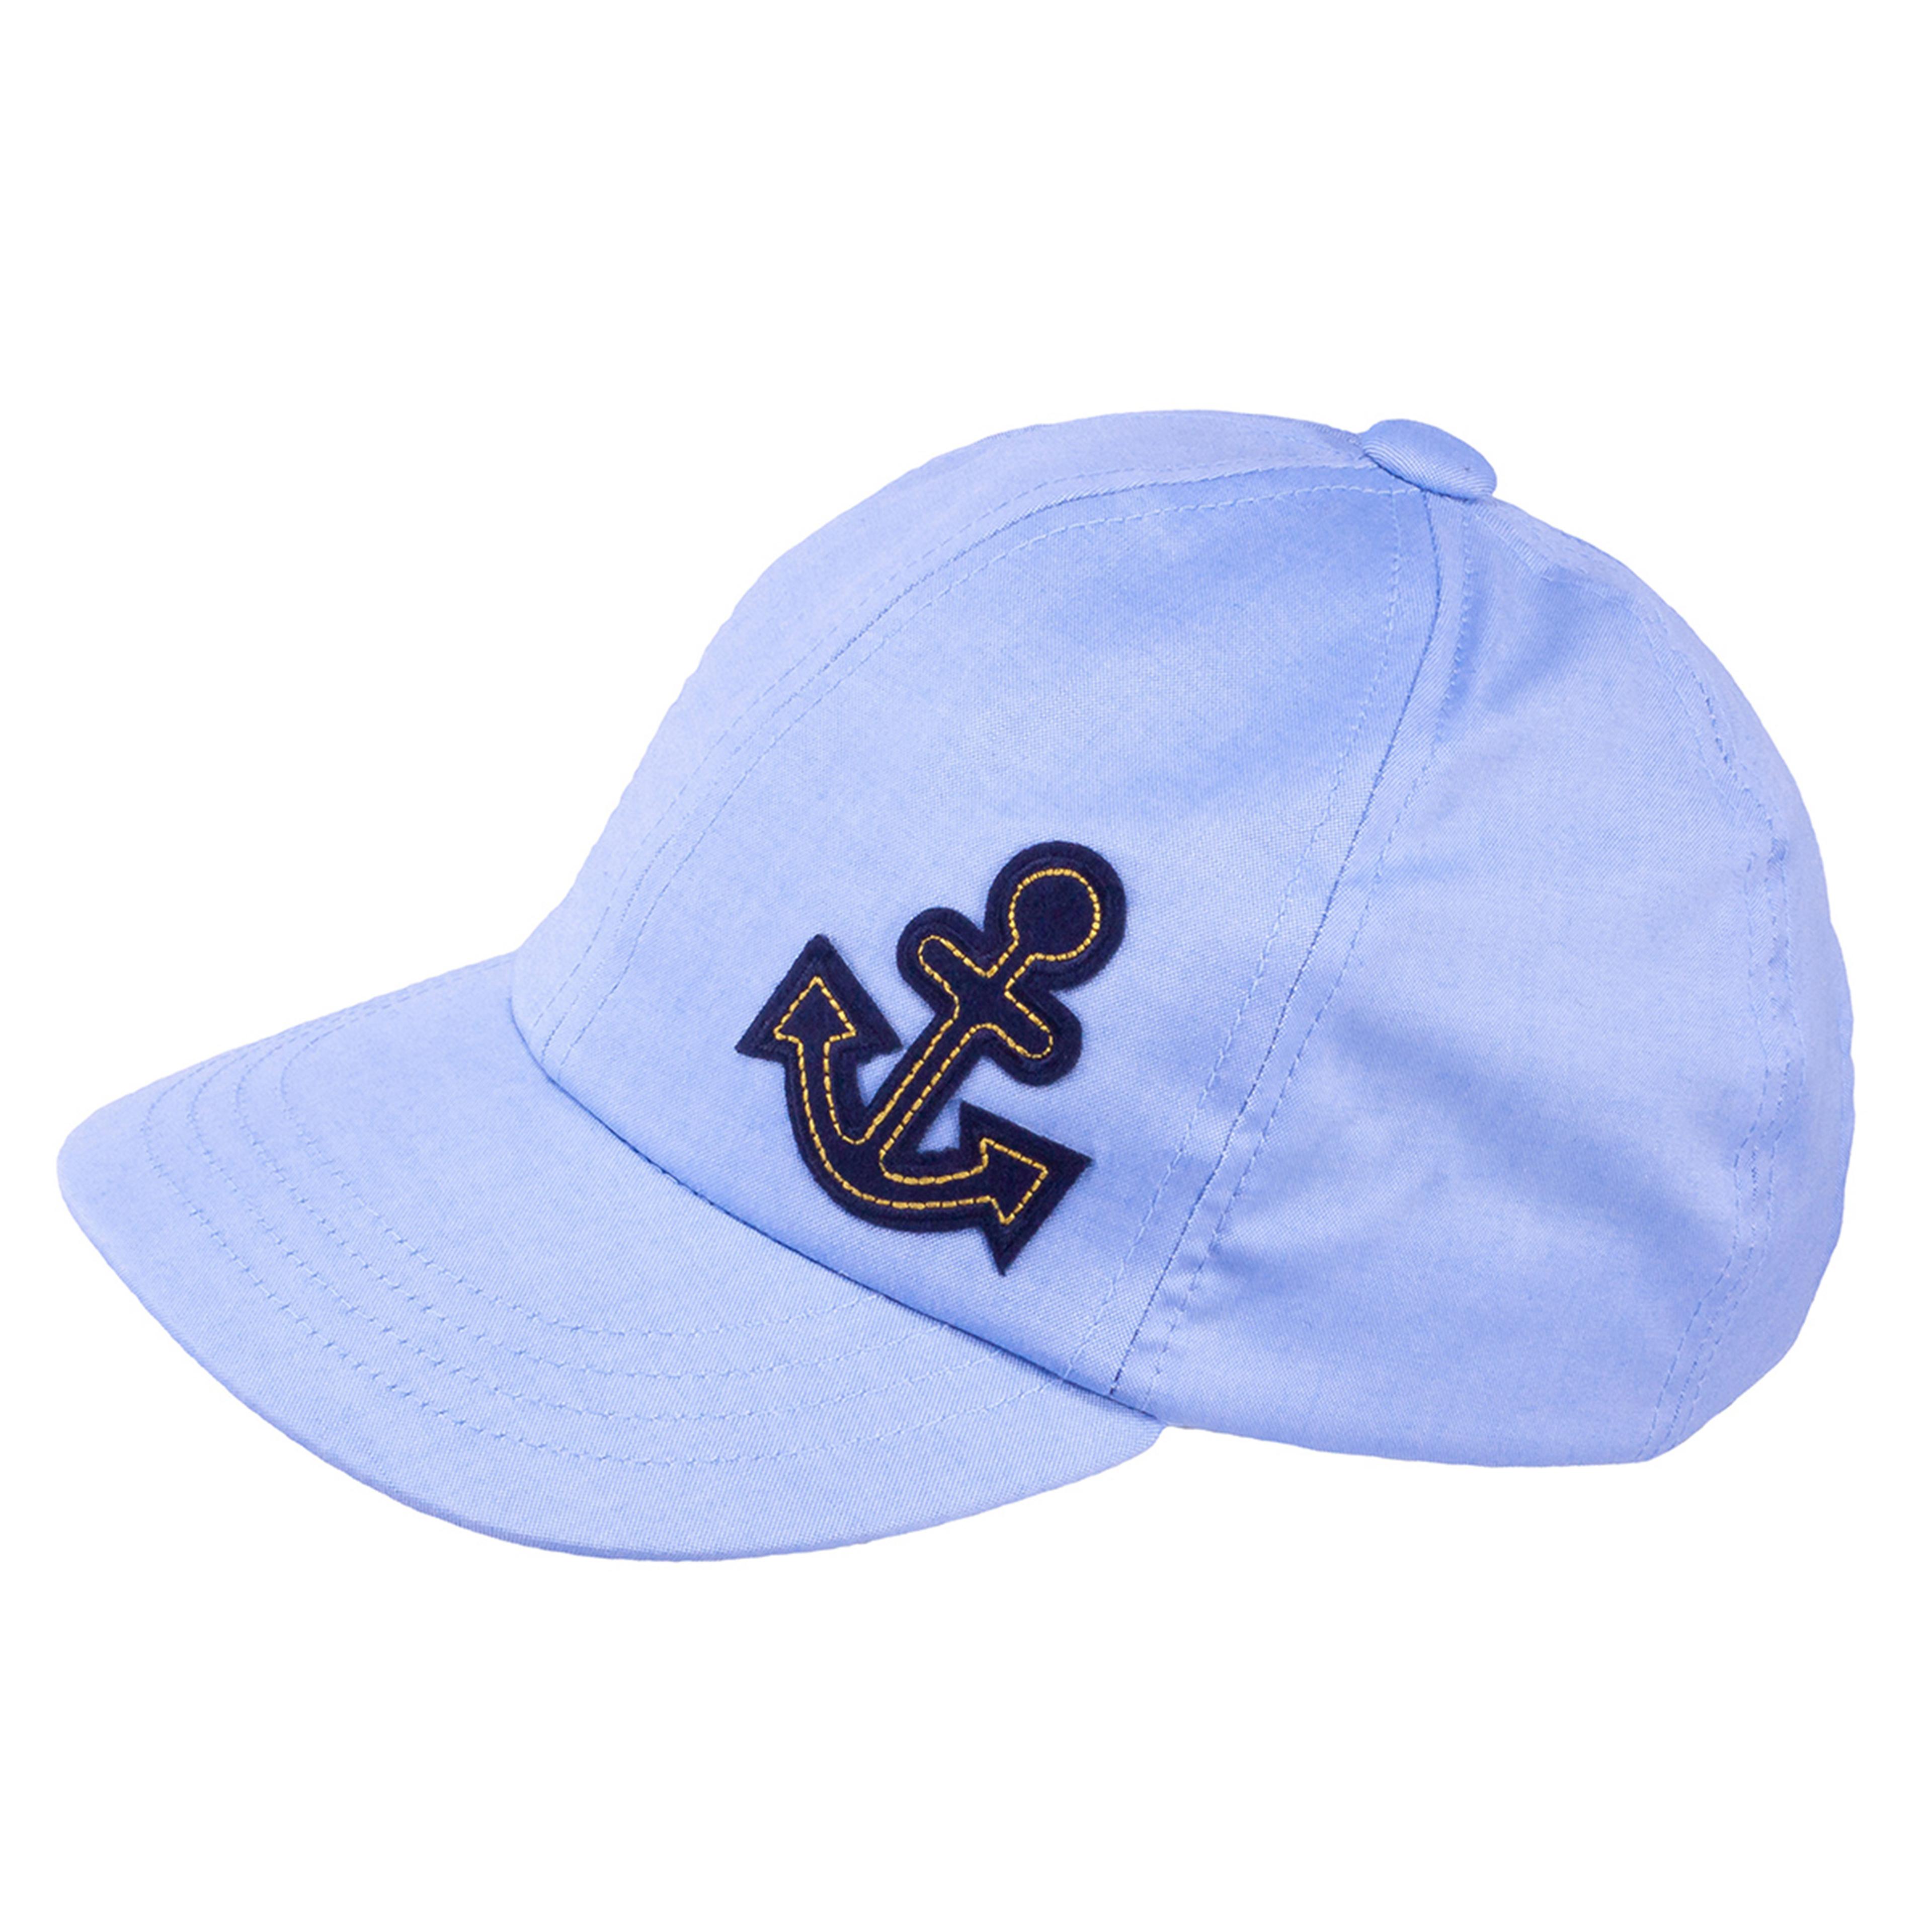 TUTU Kindermütze - Sommermütze Kappe Hellblau mit Anker Kopie